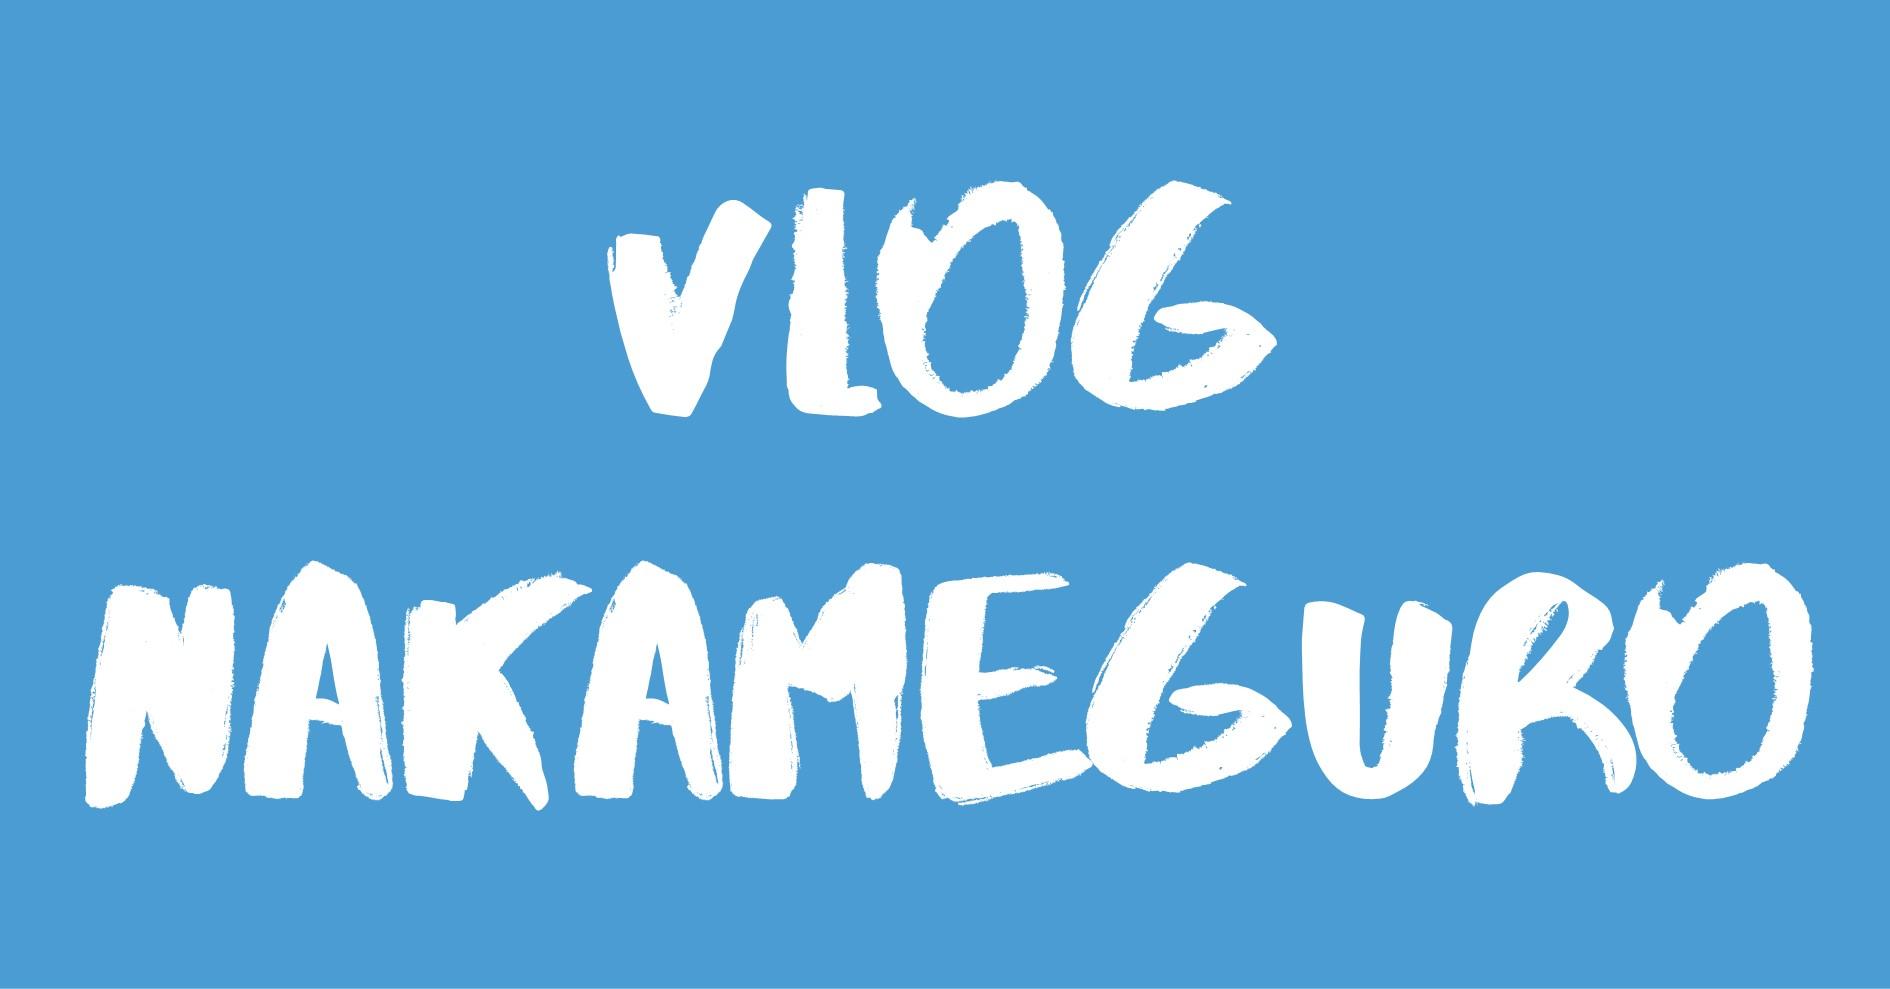 [Vlog] 中目黒 / Nakameguro